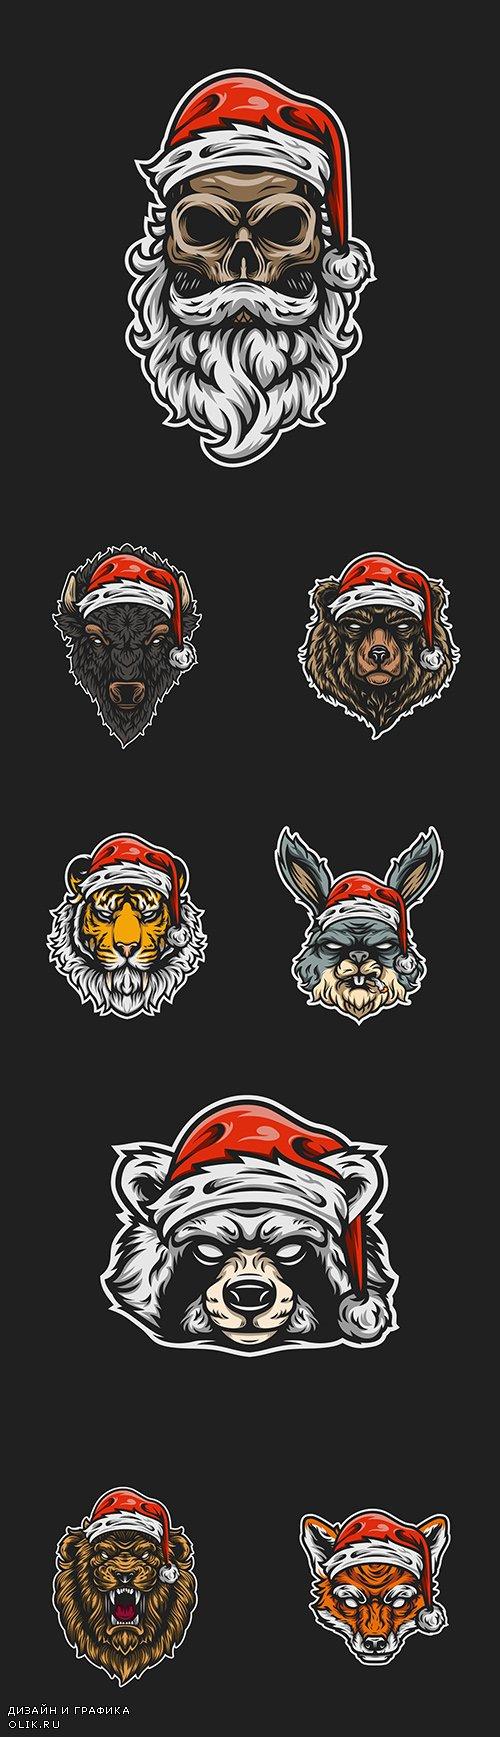 Head animals in cap of Santa painted illustrations